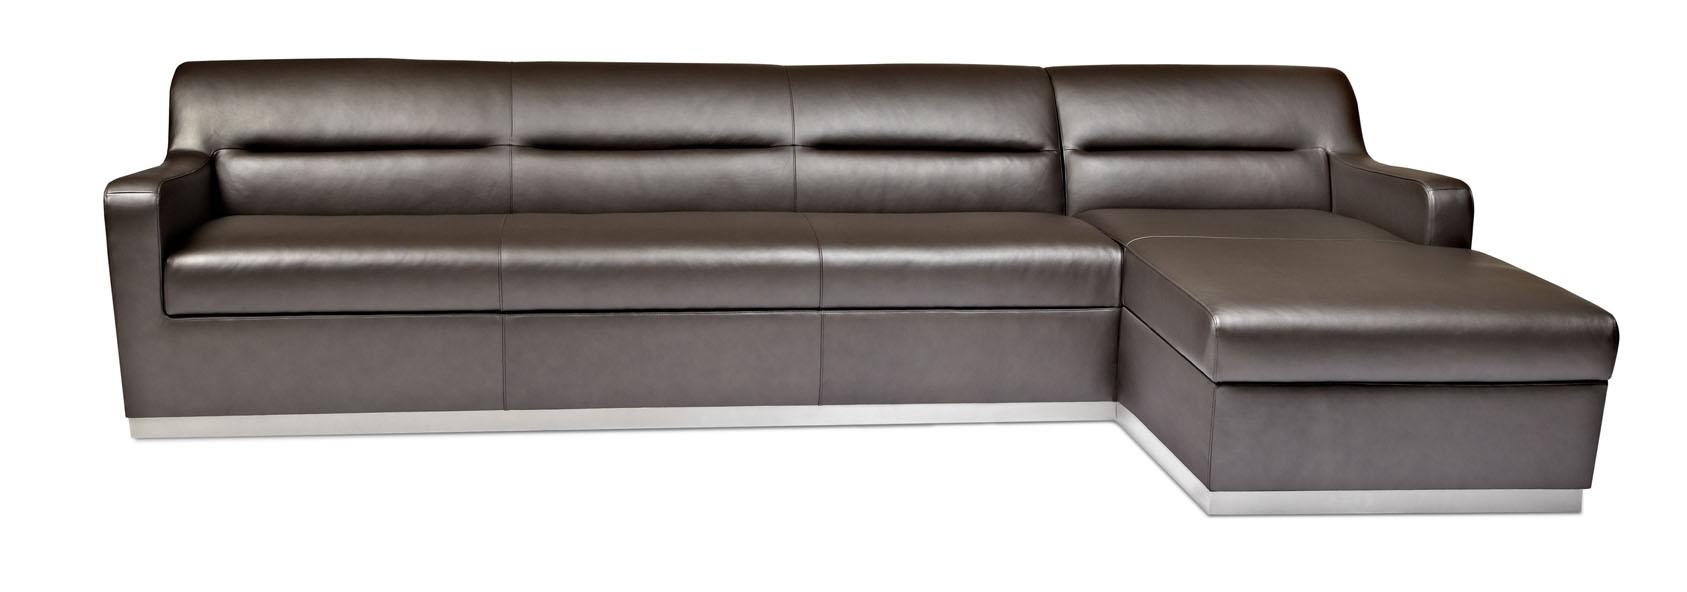 American Leather Niagara Sectional Sofa | Modern Furniture With Niagara Sectional Sofas (View 6 of 10)